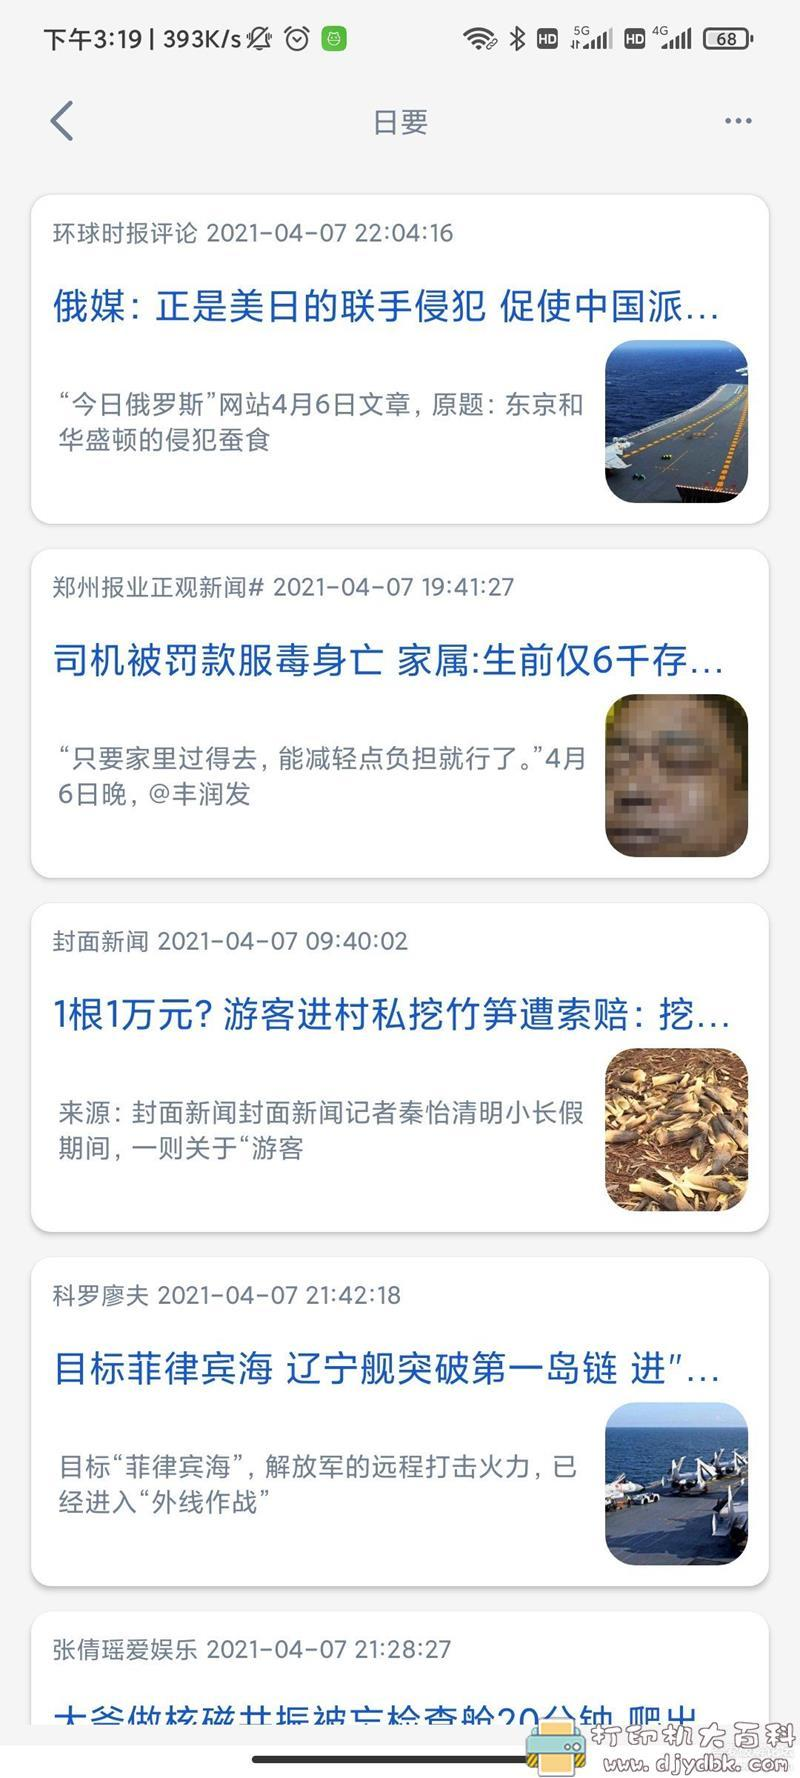 [Android]雨见浏览器5.9.5 带嗅探功能 秒搜剧 配图 No.4